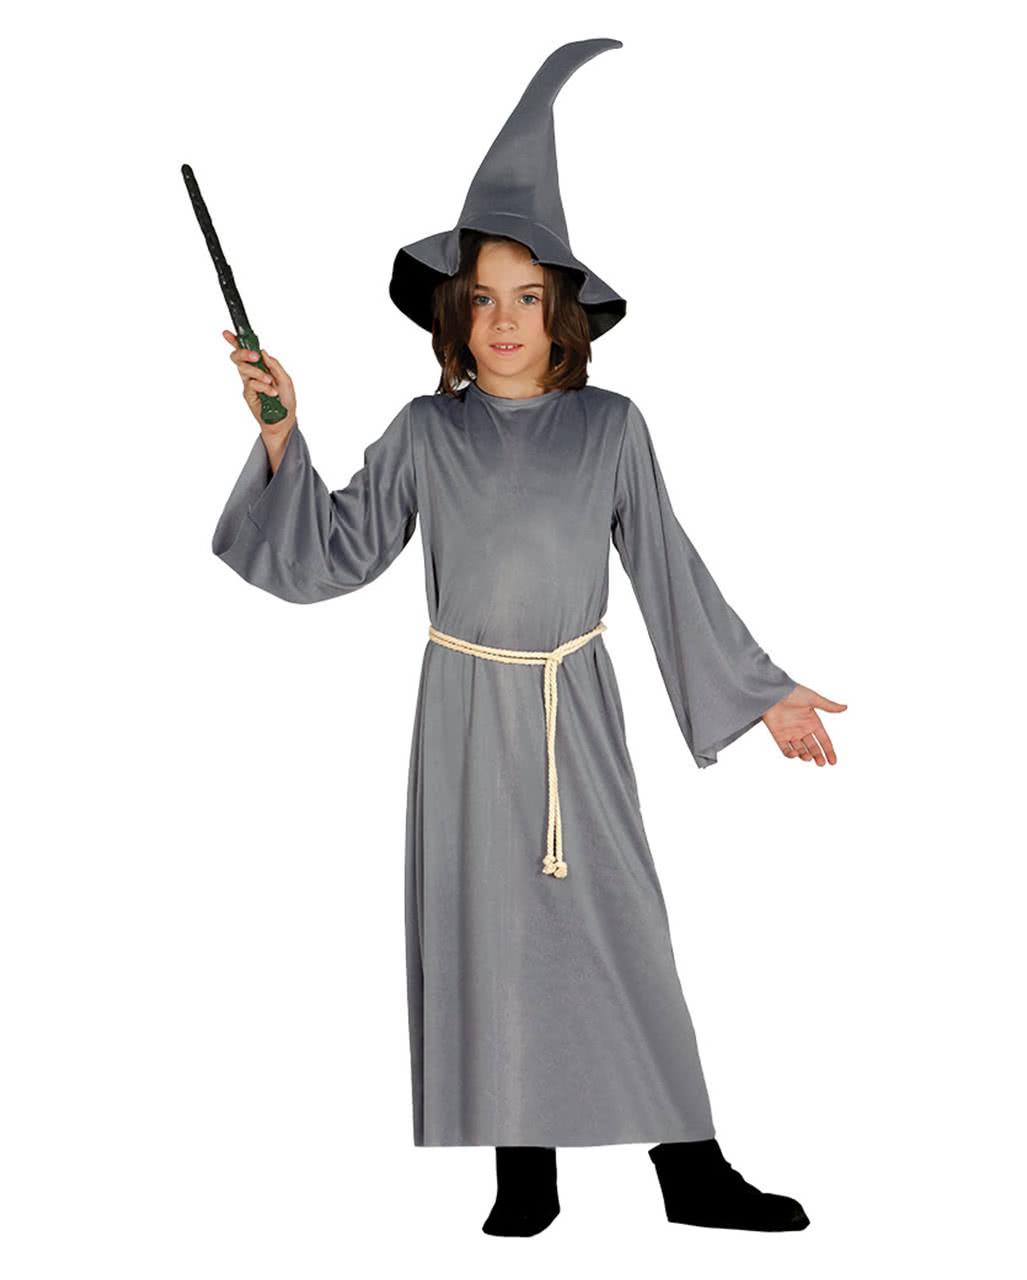 Fantasy wizard costume with hat | Weiser small Warlock | horror ...